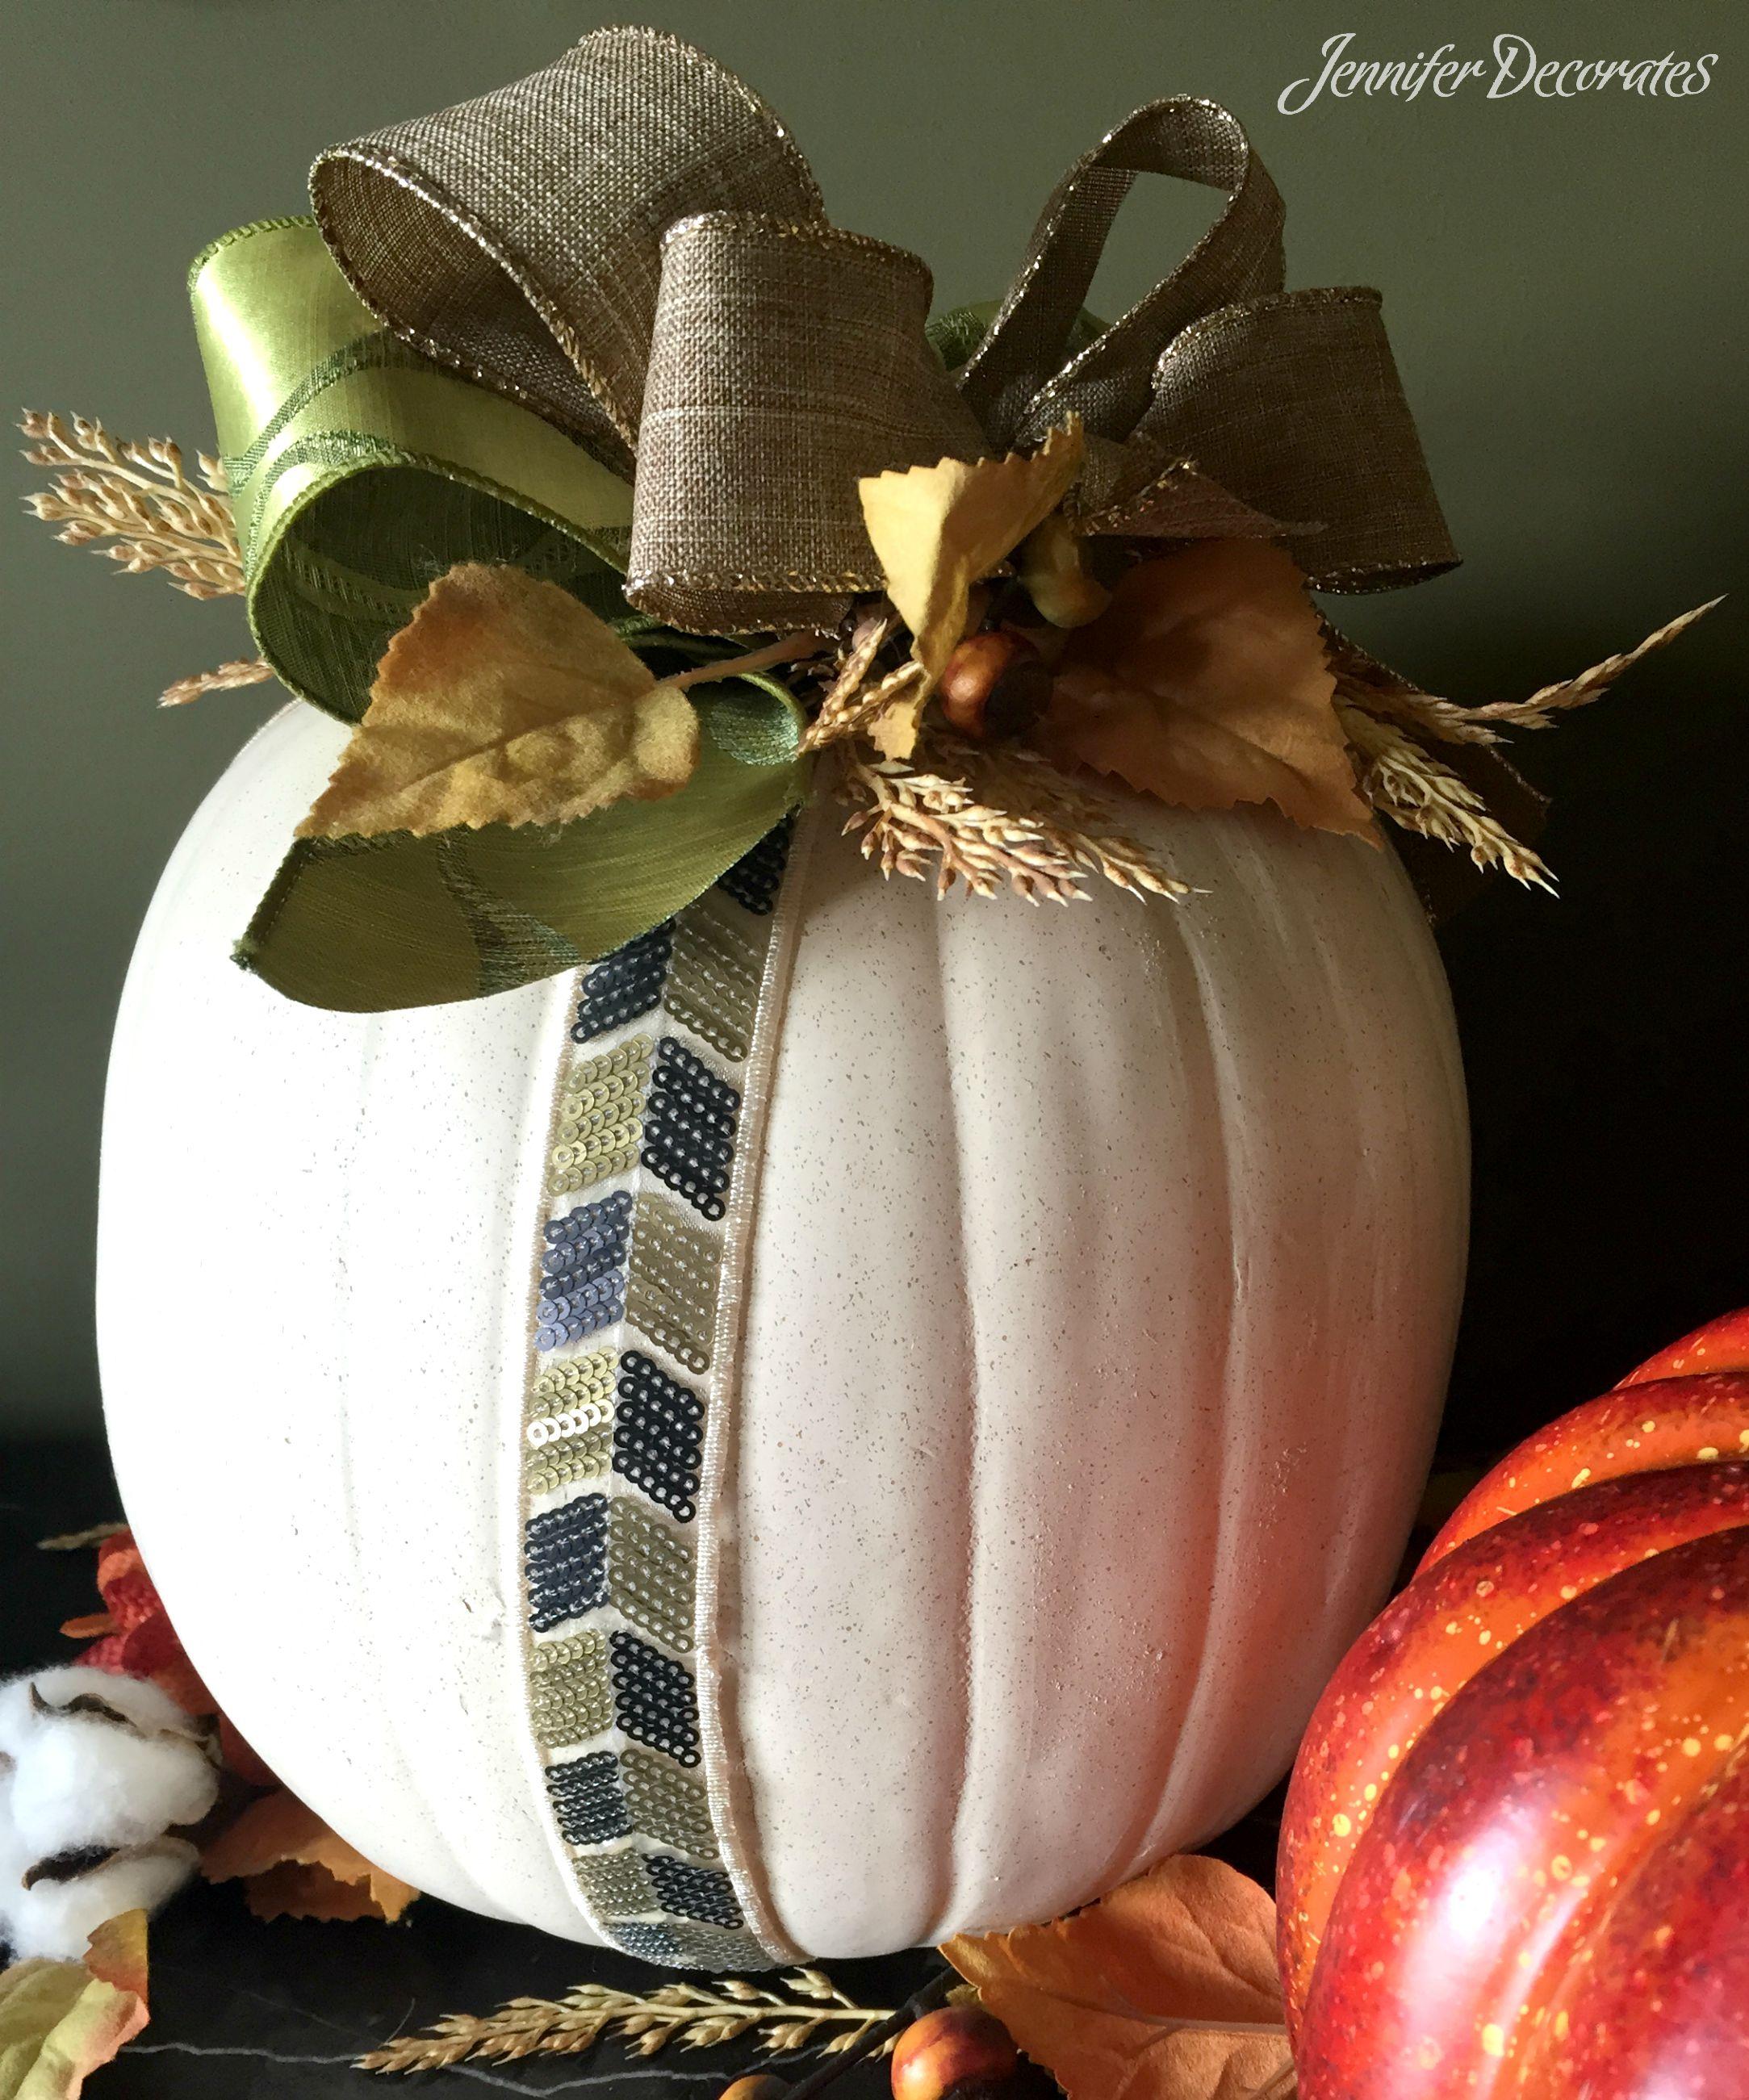 Decorating a Pumpkin from JenniferDecorates.com